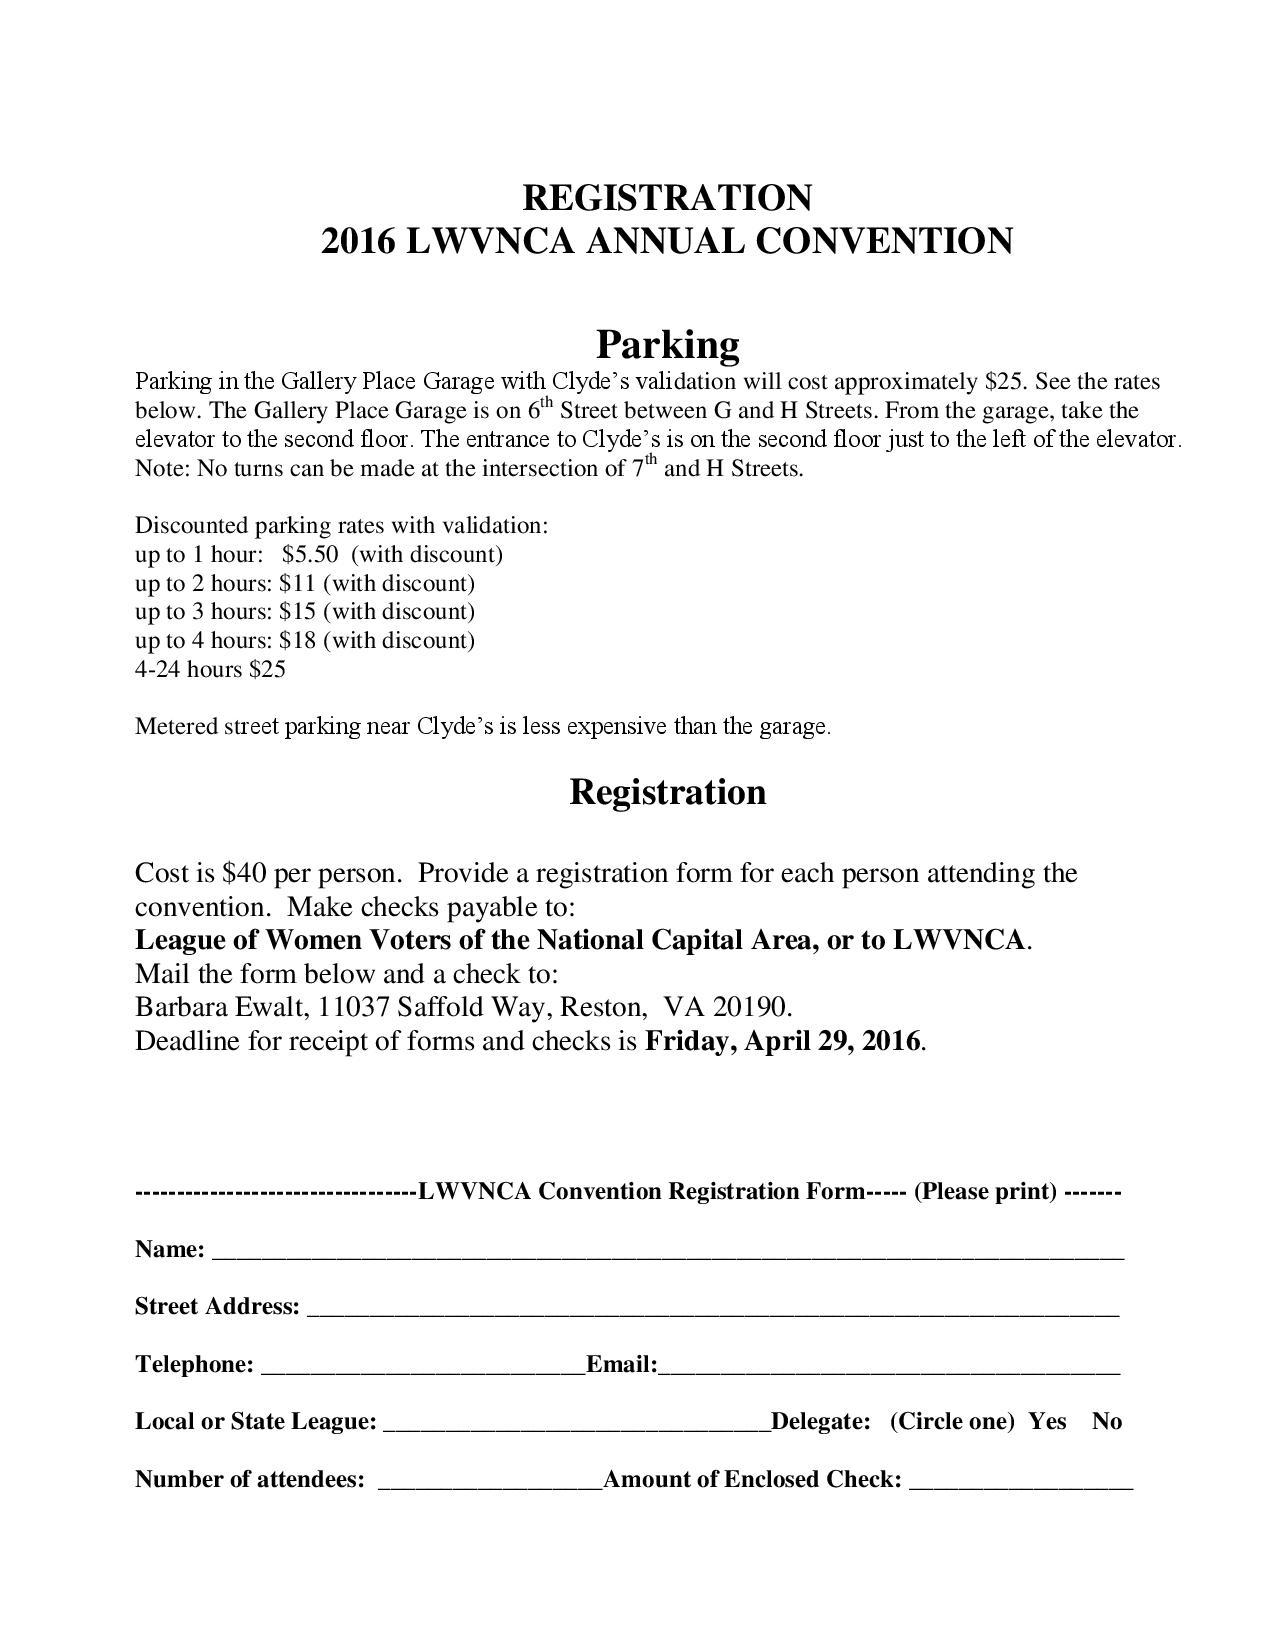 2016lwvncaconventionregistration2.jpg